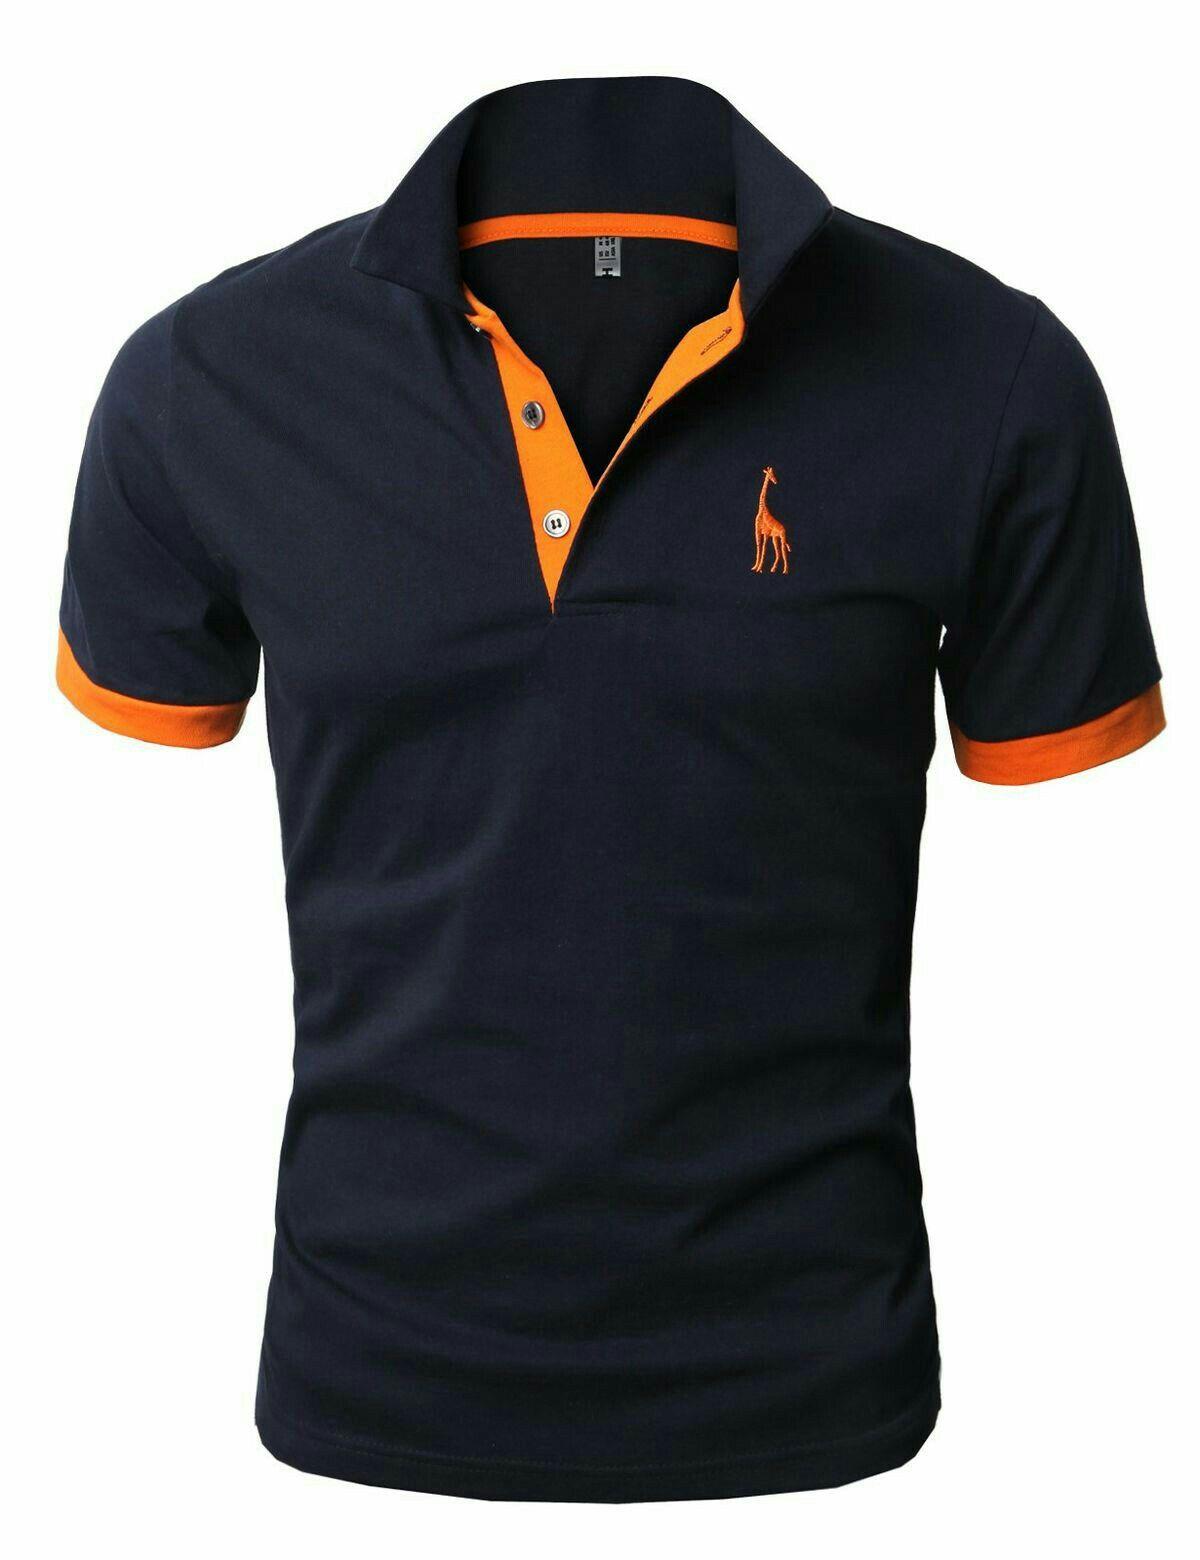 Blue Lacoste Polo Shirt | Lacoste t shirt, Lacoste polo